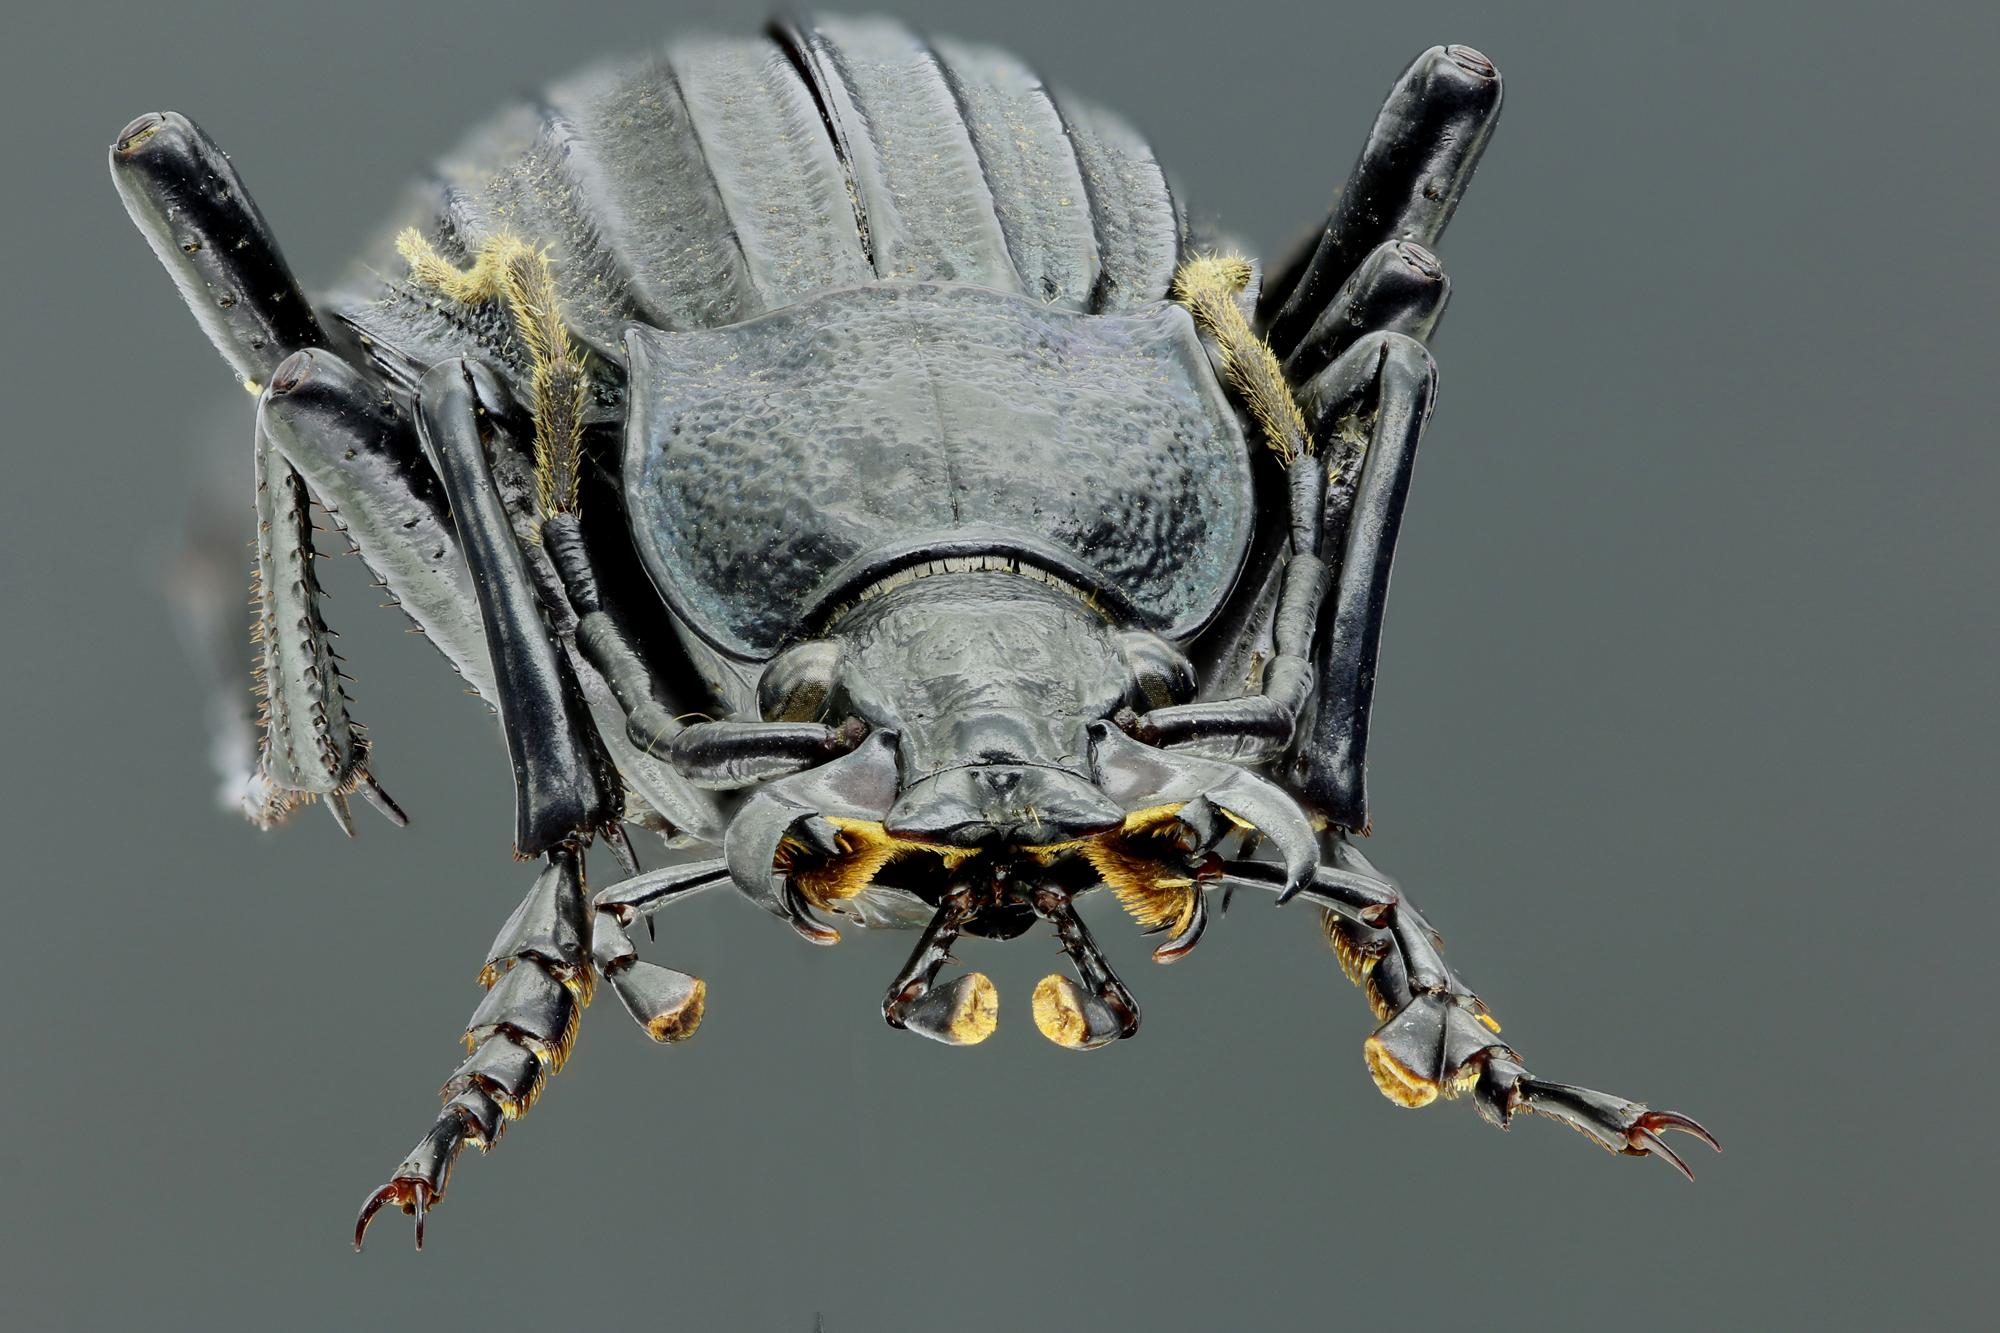 Megodontus septemcarinatus 46566zs12.jpg